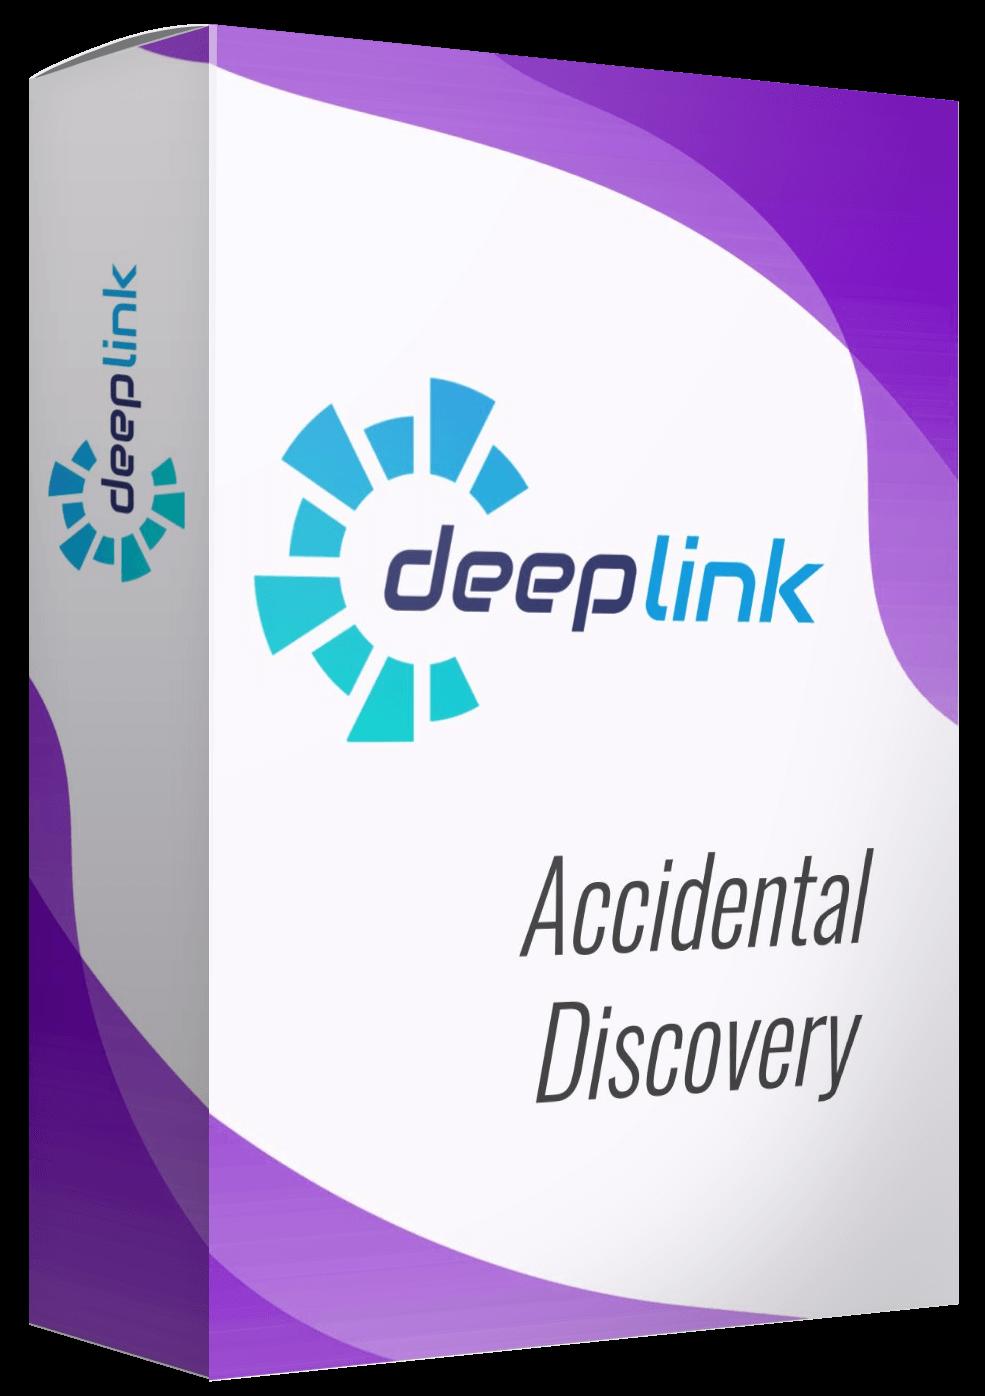 DeepLink-oto-6